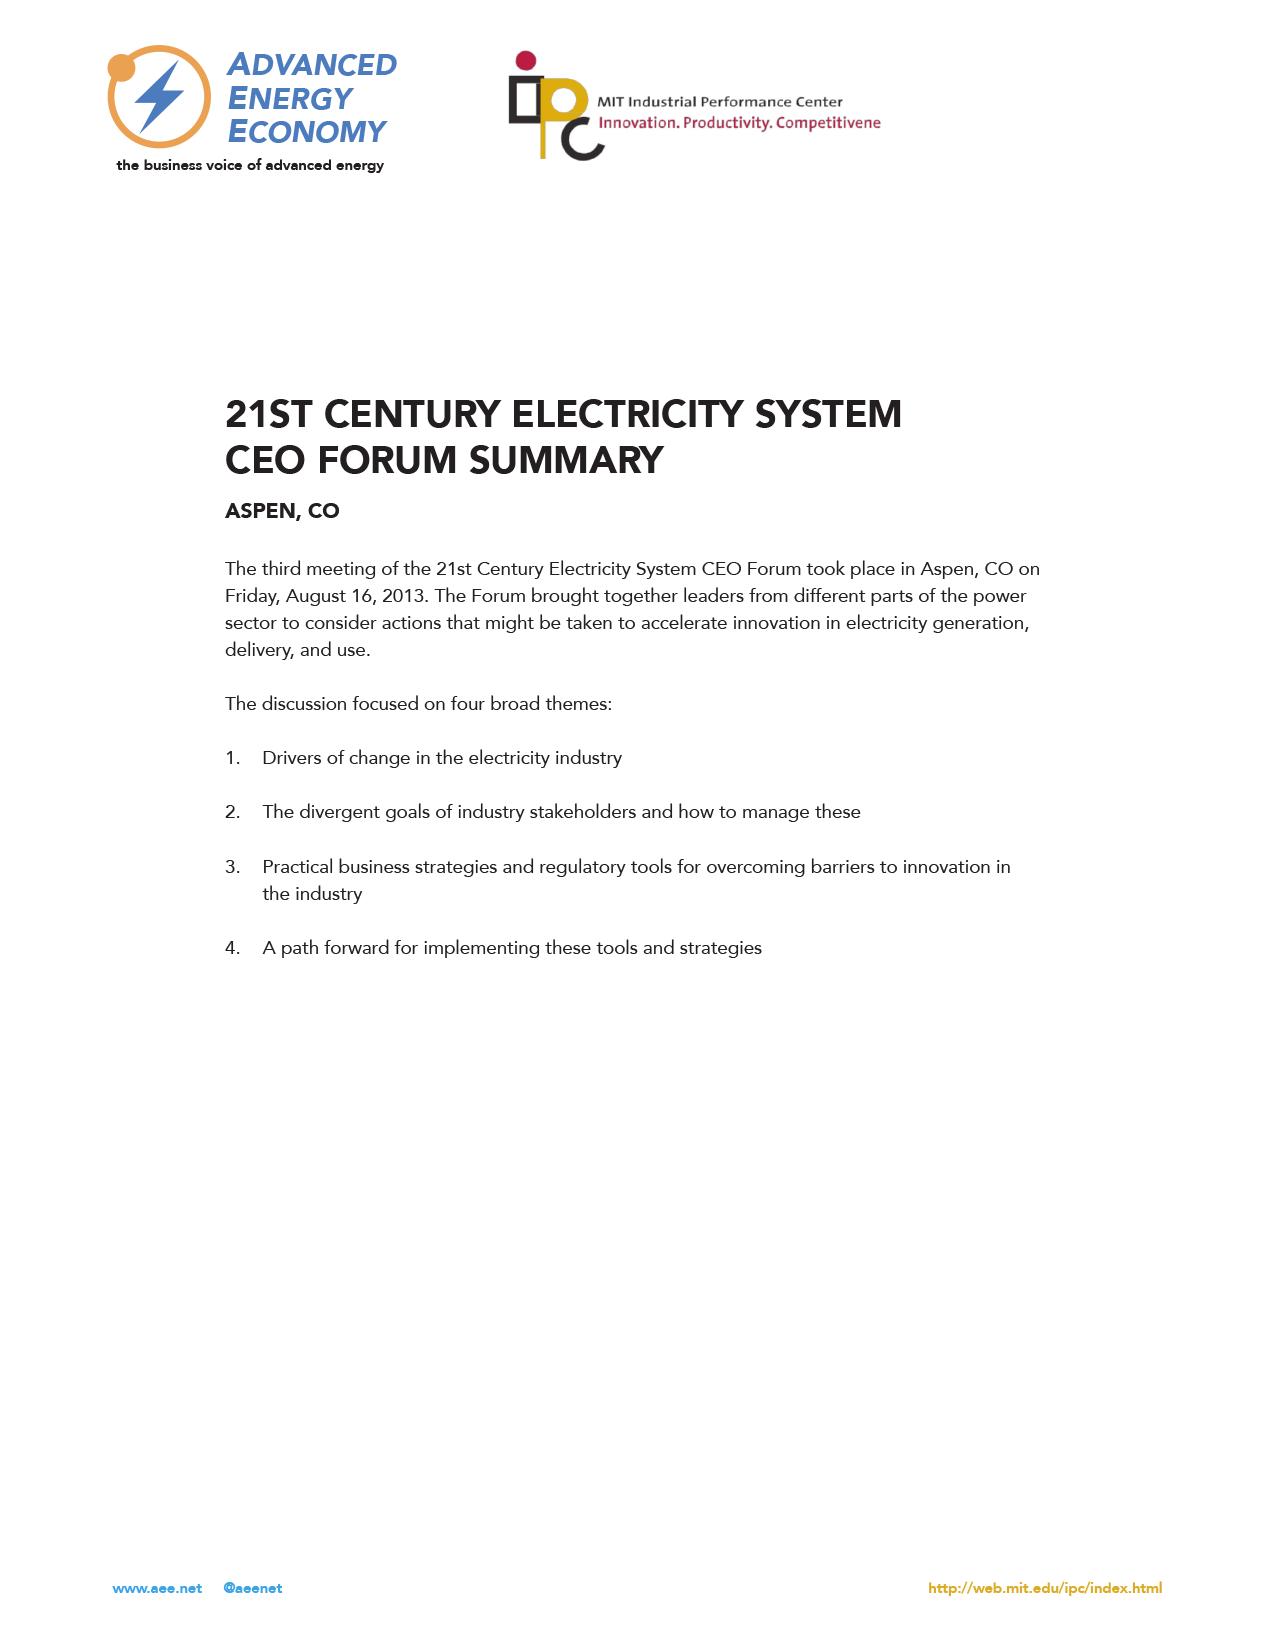 21st Century Electricity System CEO Forum - Aspen, CO